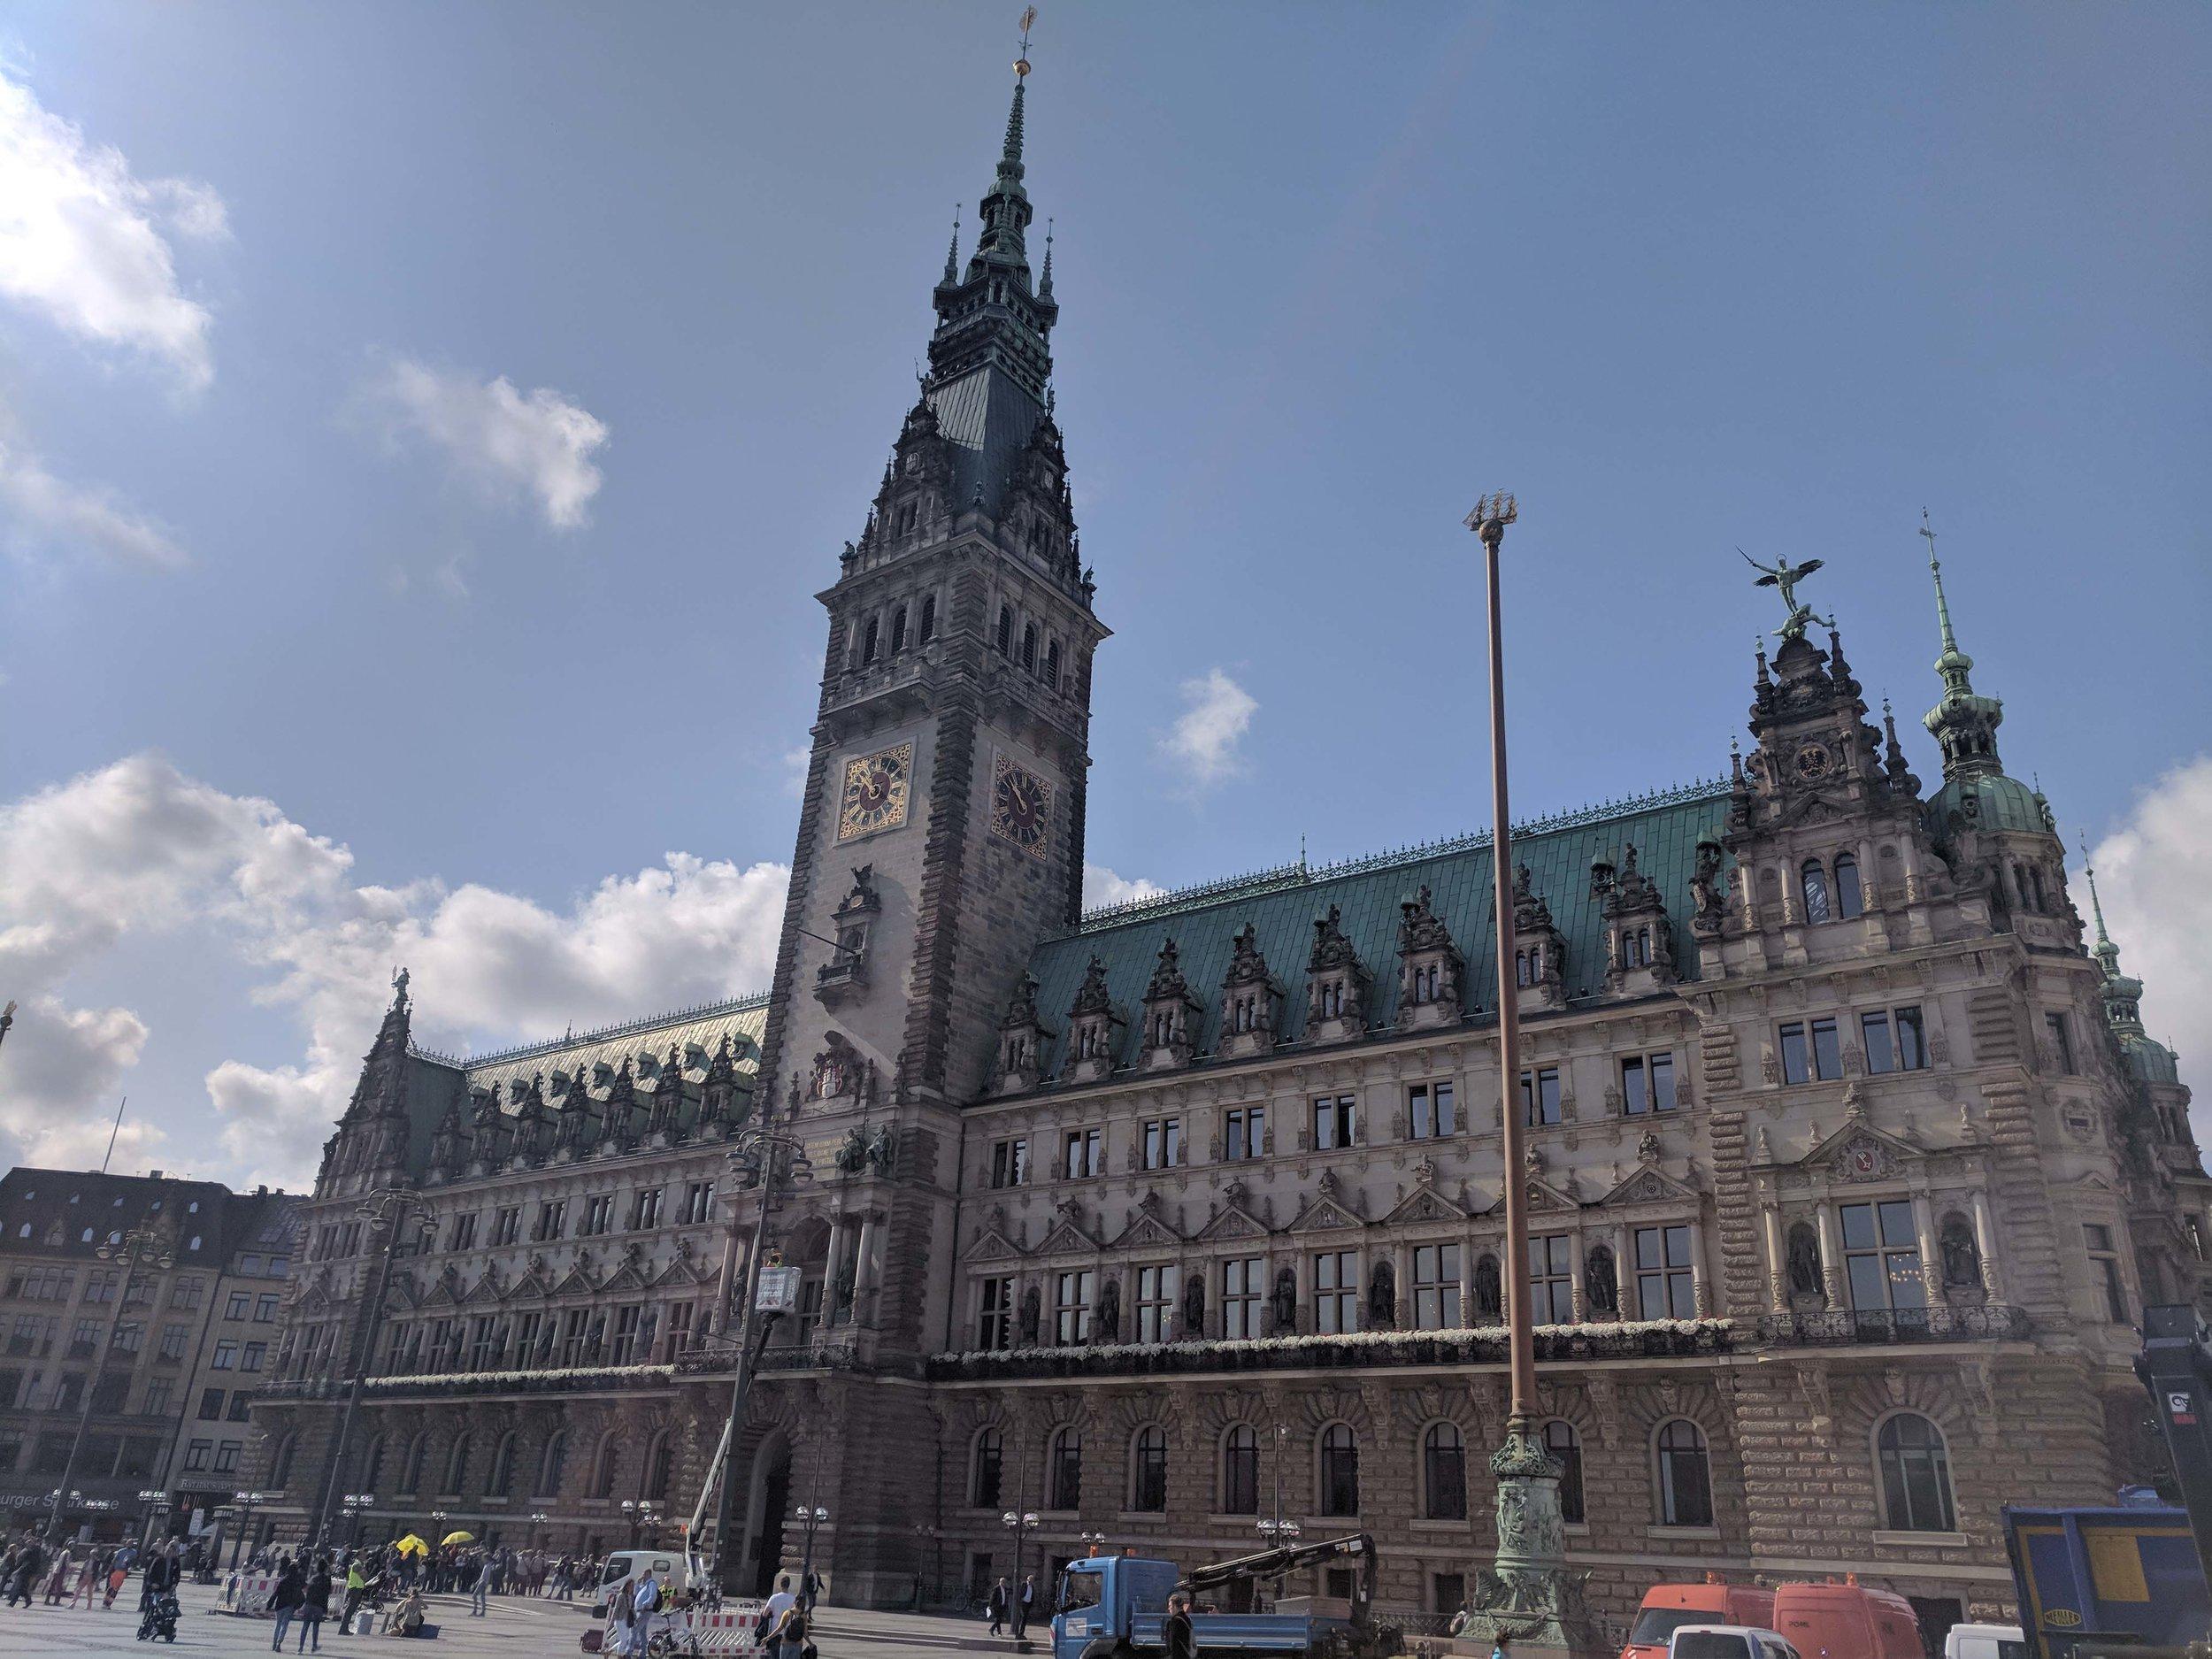 The nicer parts of Hamburg - The Rathaus